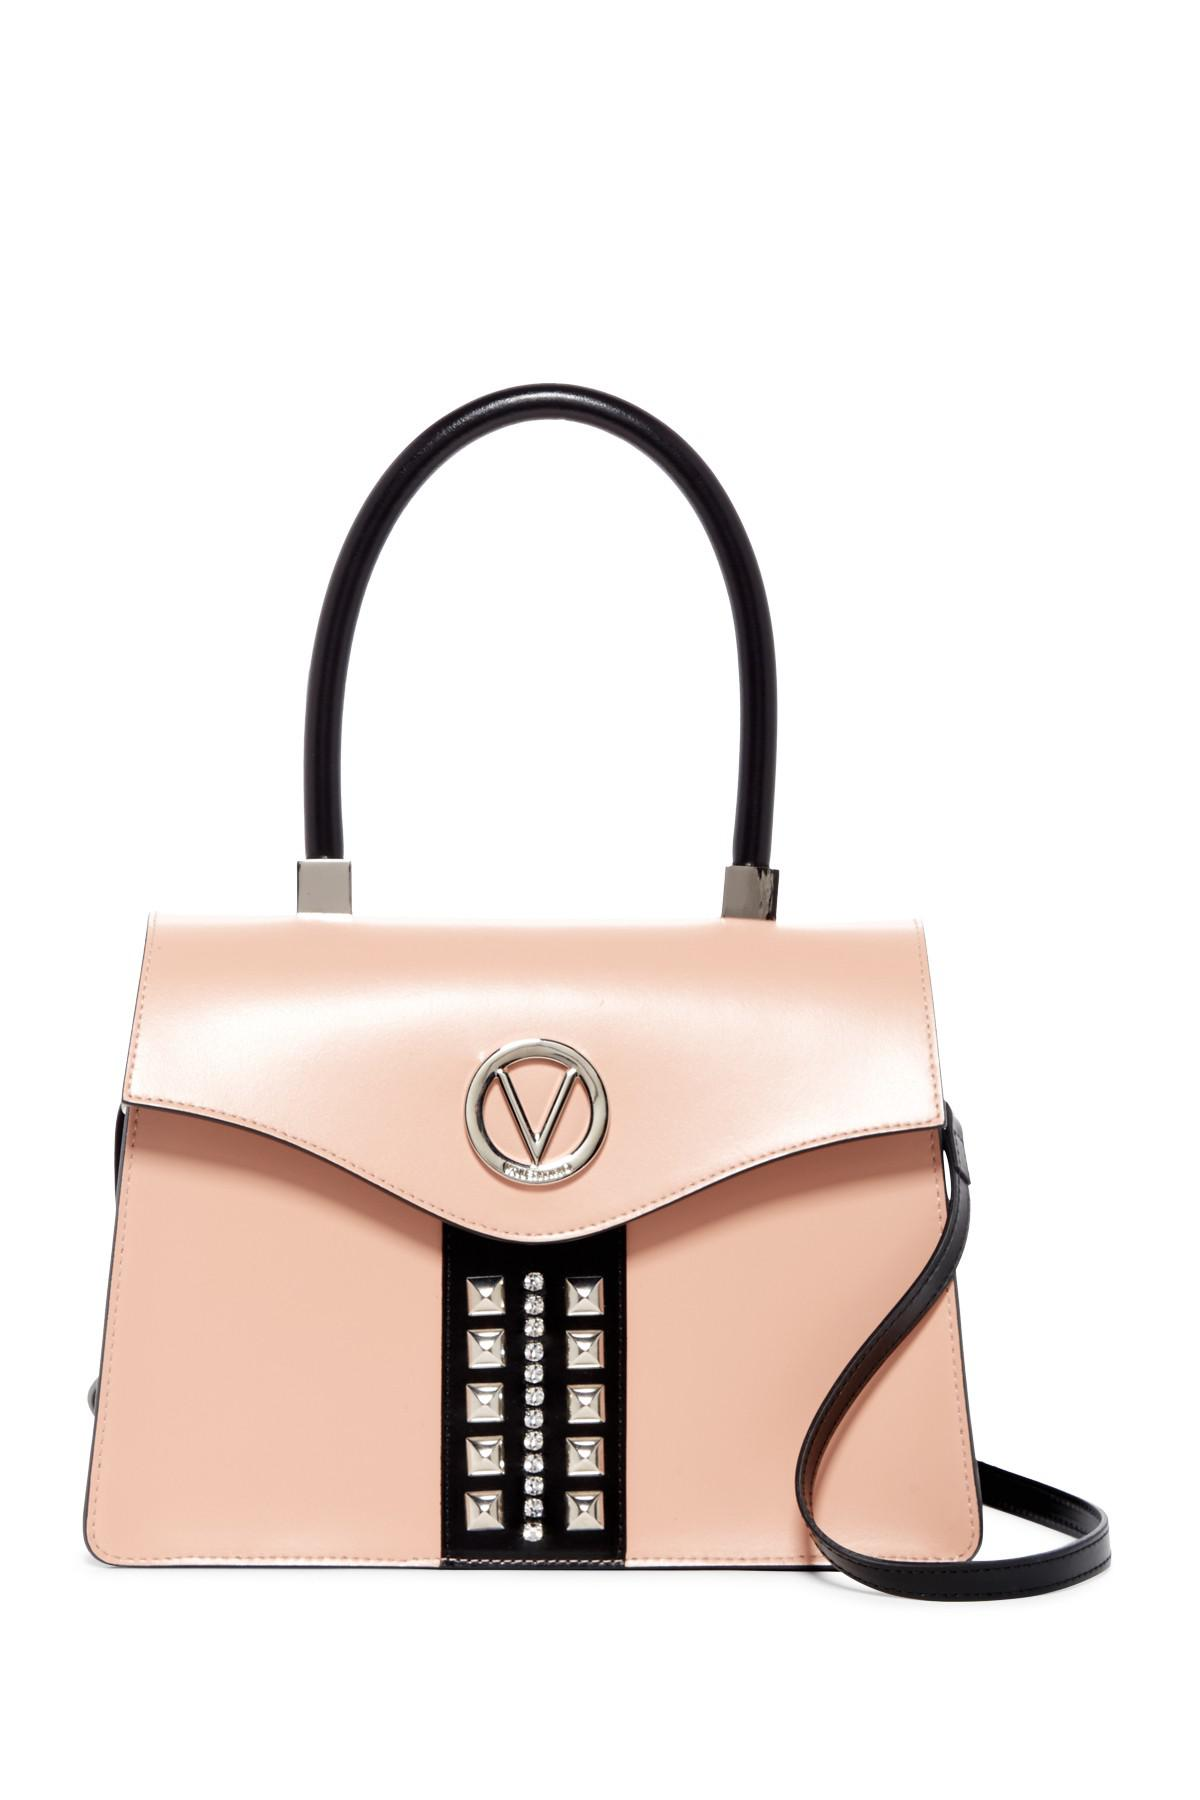 3764d5b1e09 Valentino By Mario Valentino Melanie Sve Rose Black Leather Satchel ...